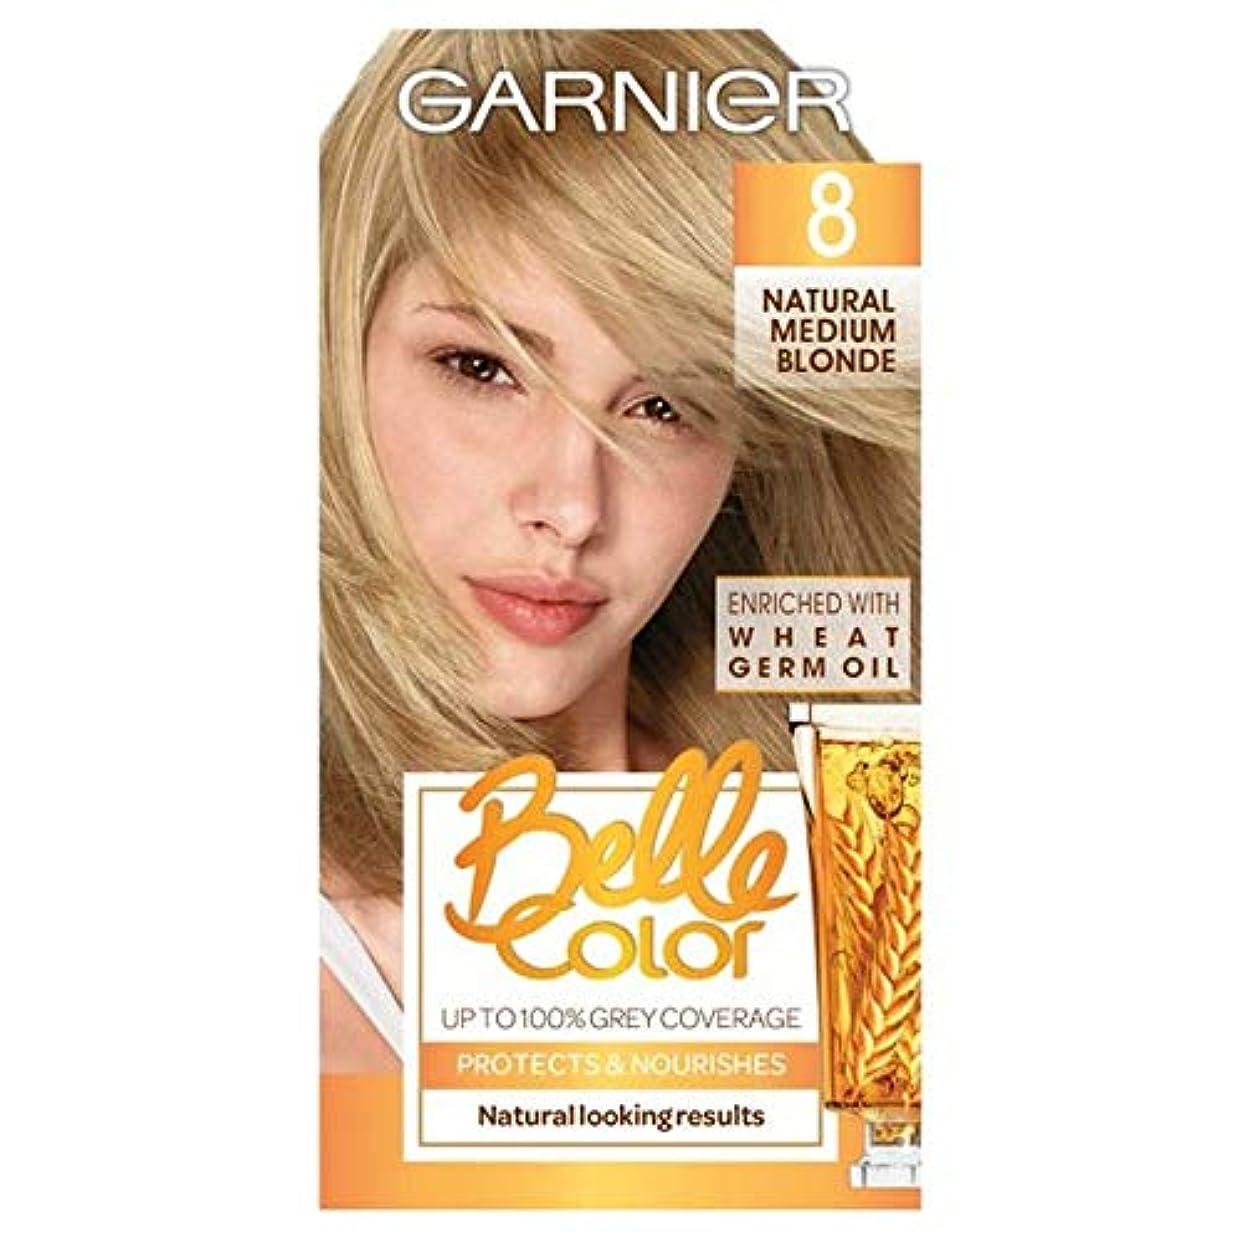 [Belle Color ] ガーン/ベル/Clr 8天然培地ブロンドパーマネントヘアダイ - Garn/Bel/Clr 8 Natural Medium Blonde Permanent Hair Dye [並行輸入品]